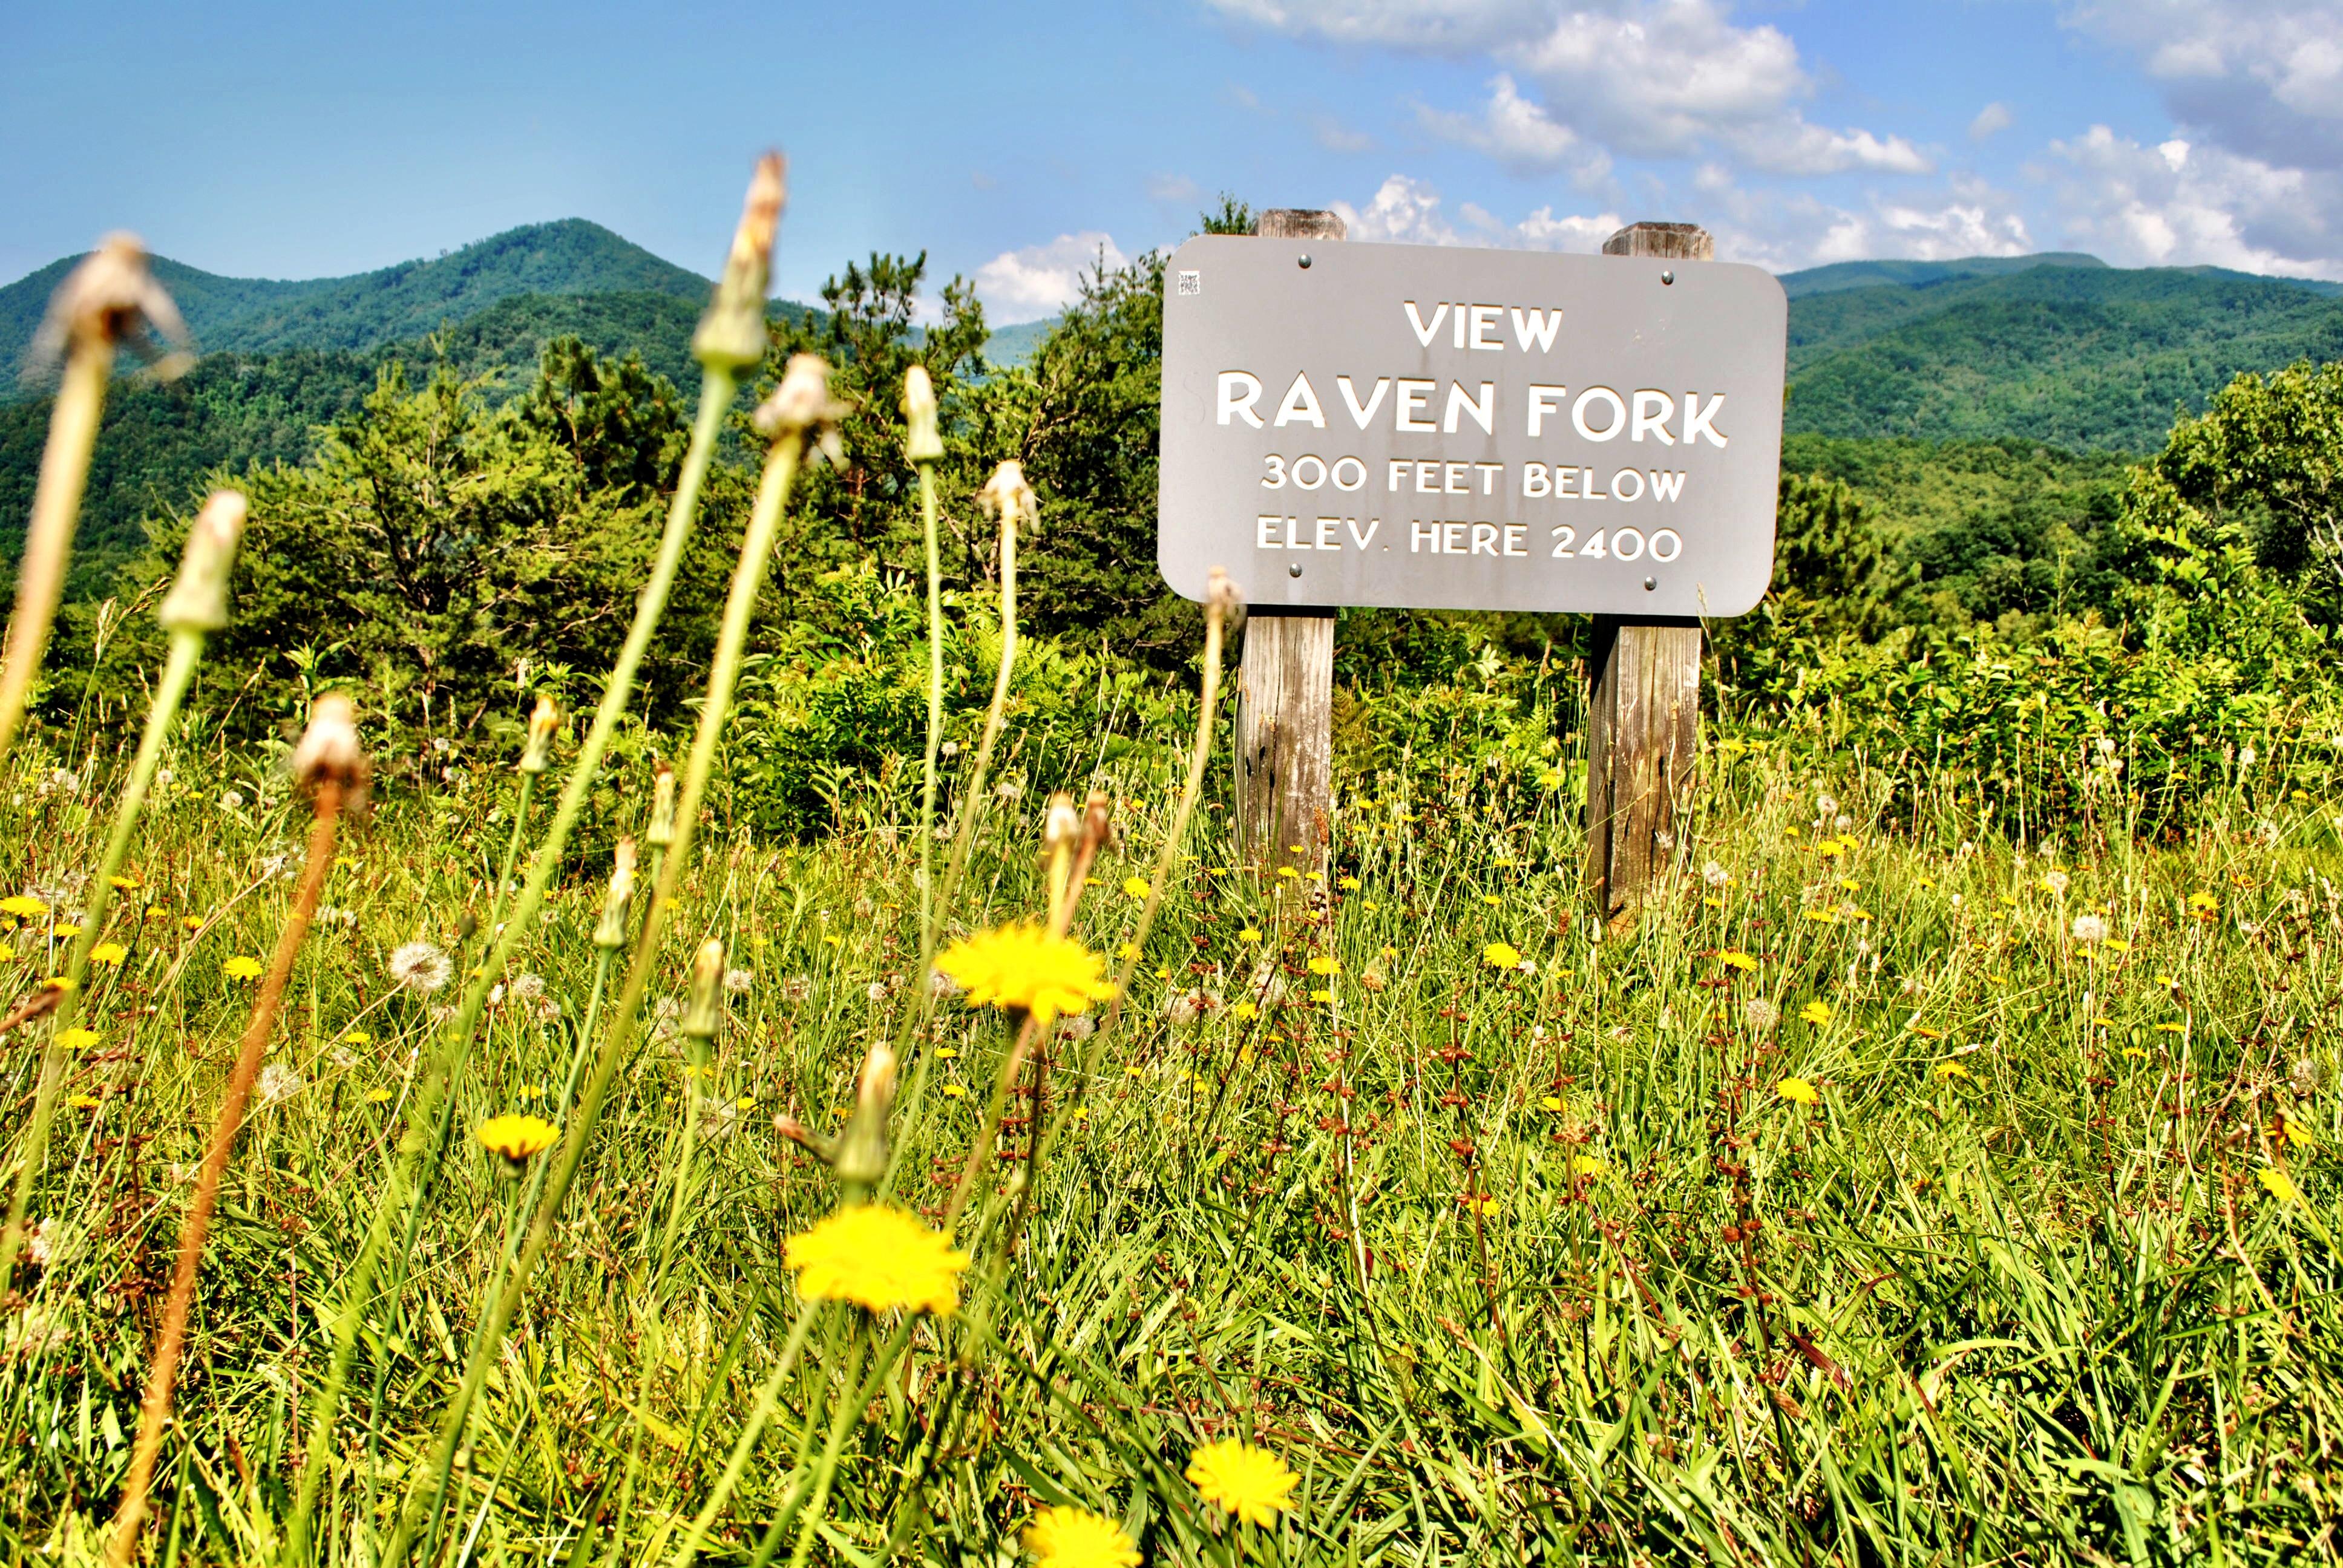 Raven Fork View in North Carolina